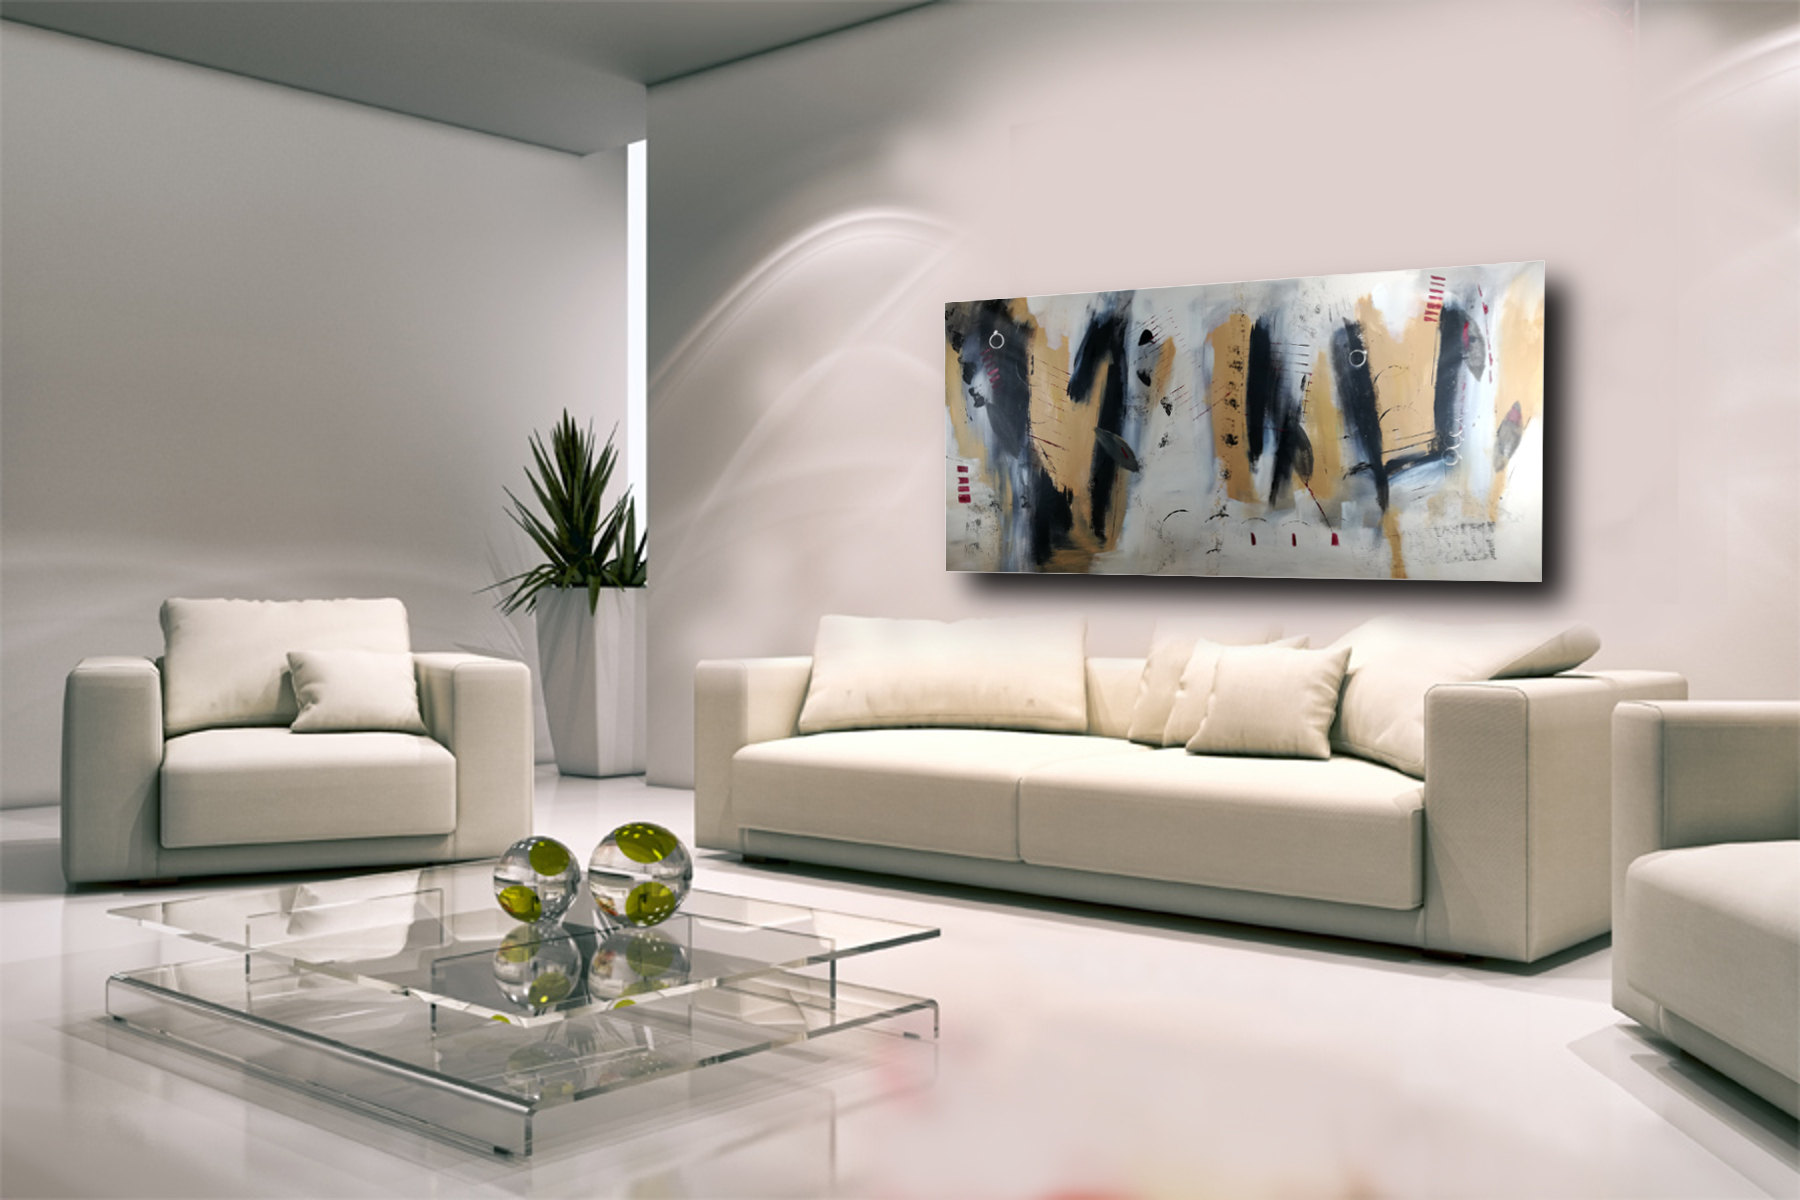 dipinto a mano grande per soggiorno 200x100 | sauro bos